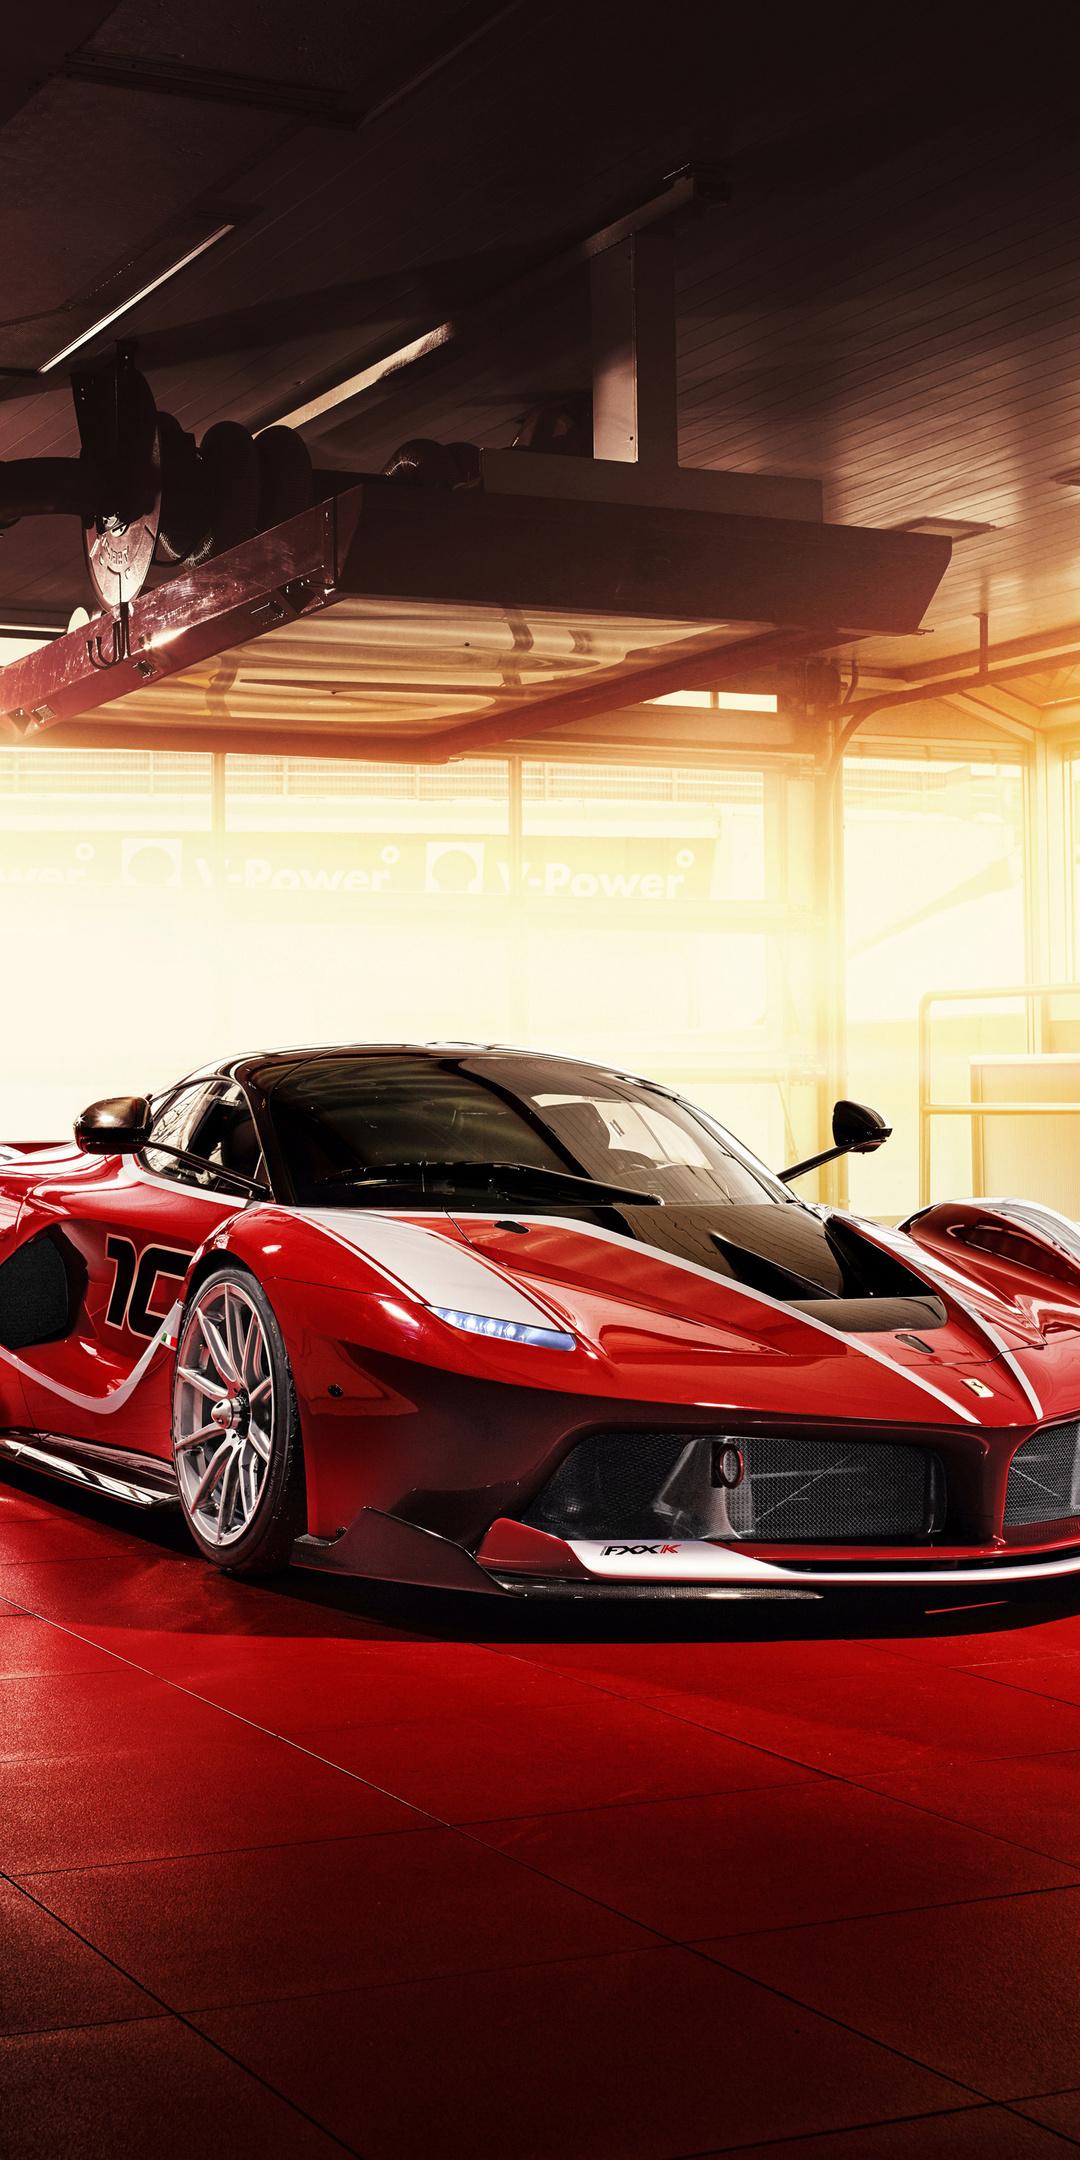 1080x2160 Ferrari Fxx K Sport Car One Plus 5t Honor 7x Honor View 10